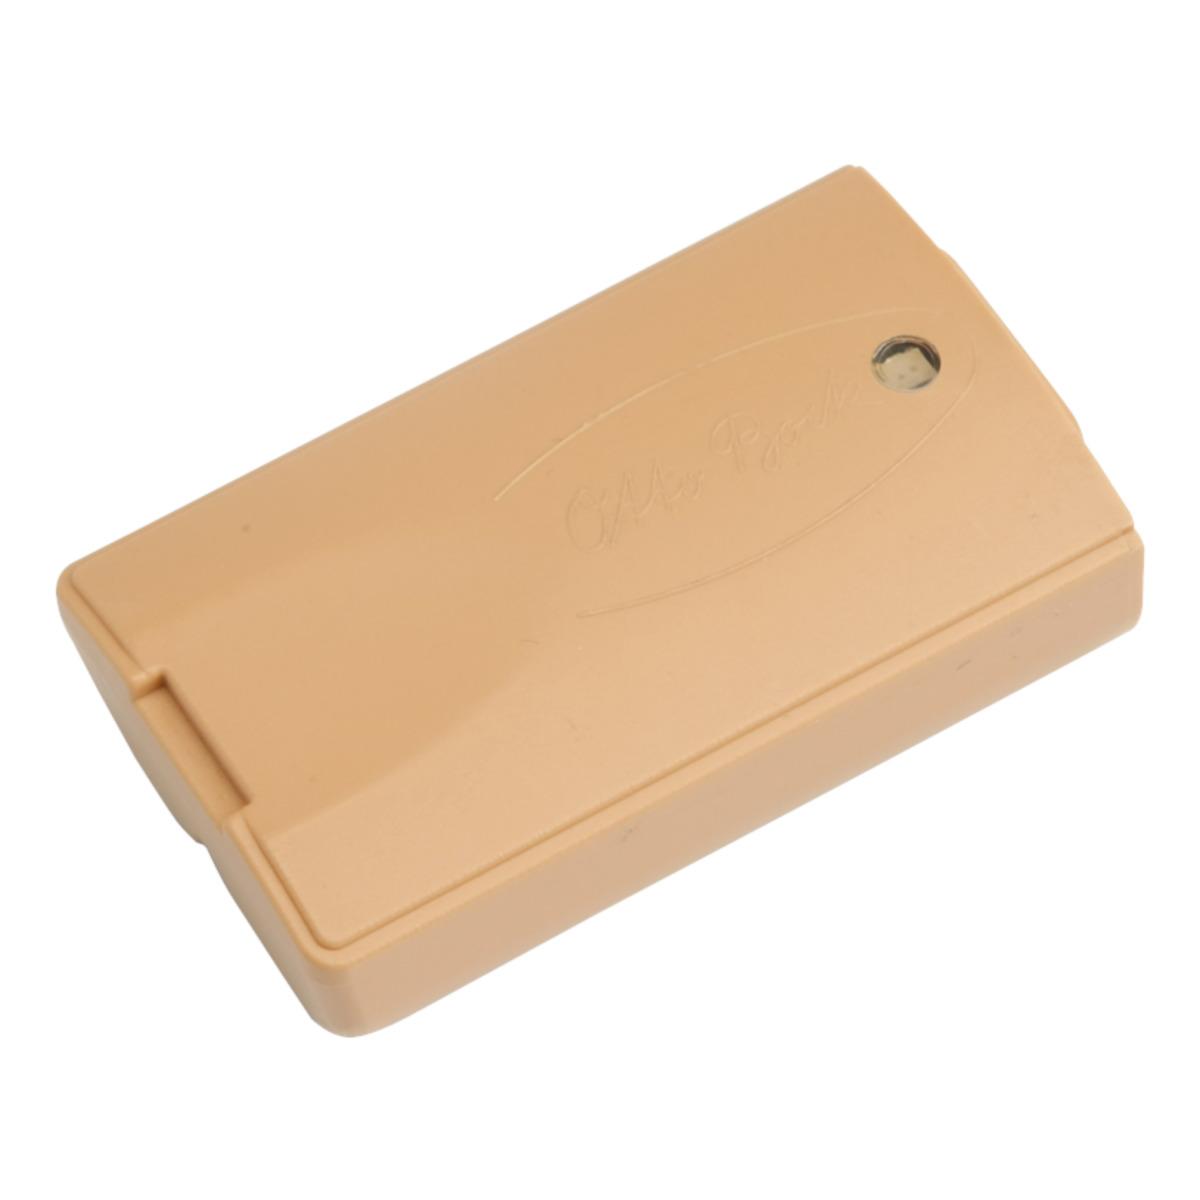 Otto Bock EnergyPack | Batteries | Myo Batteries / Chargers | Myo